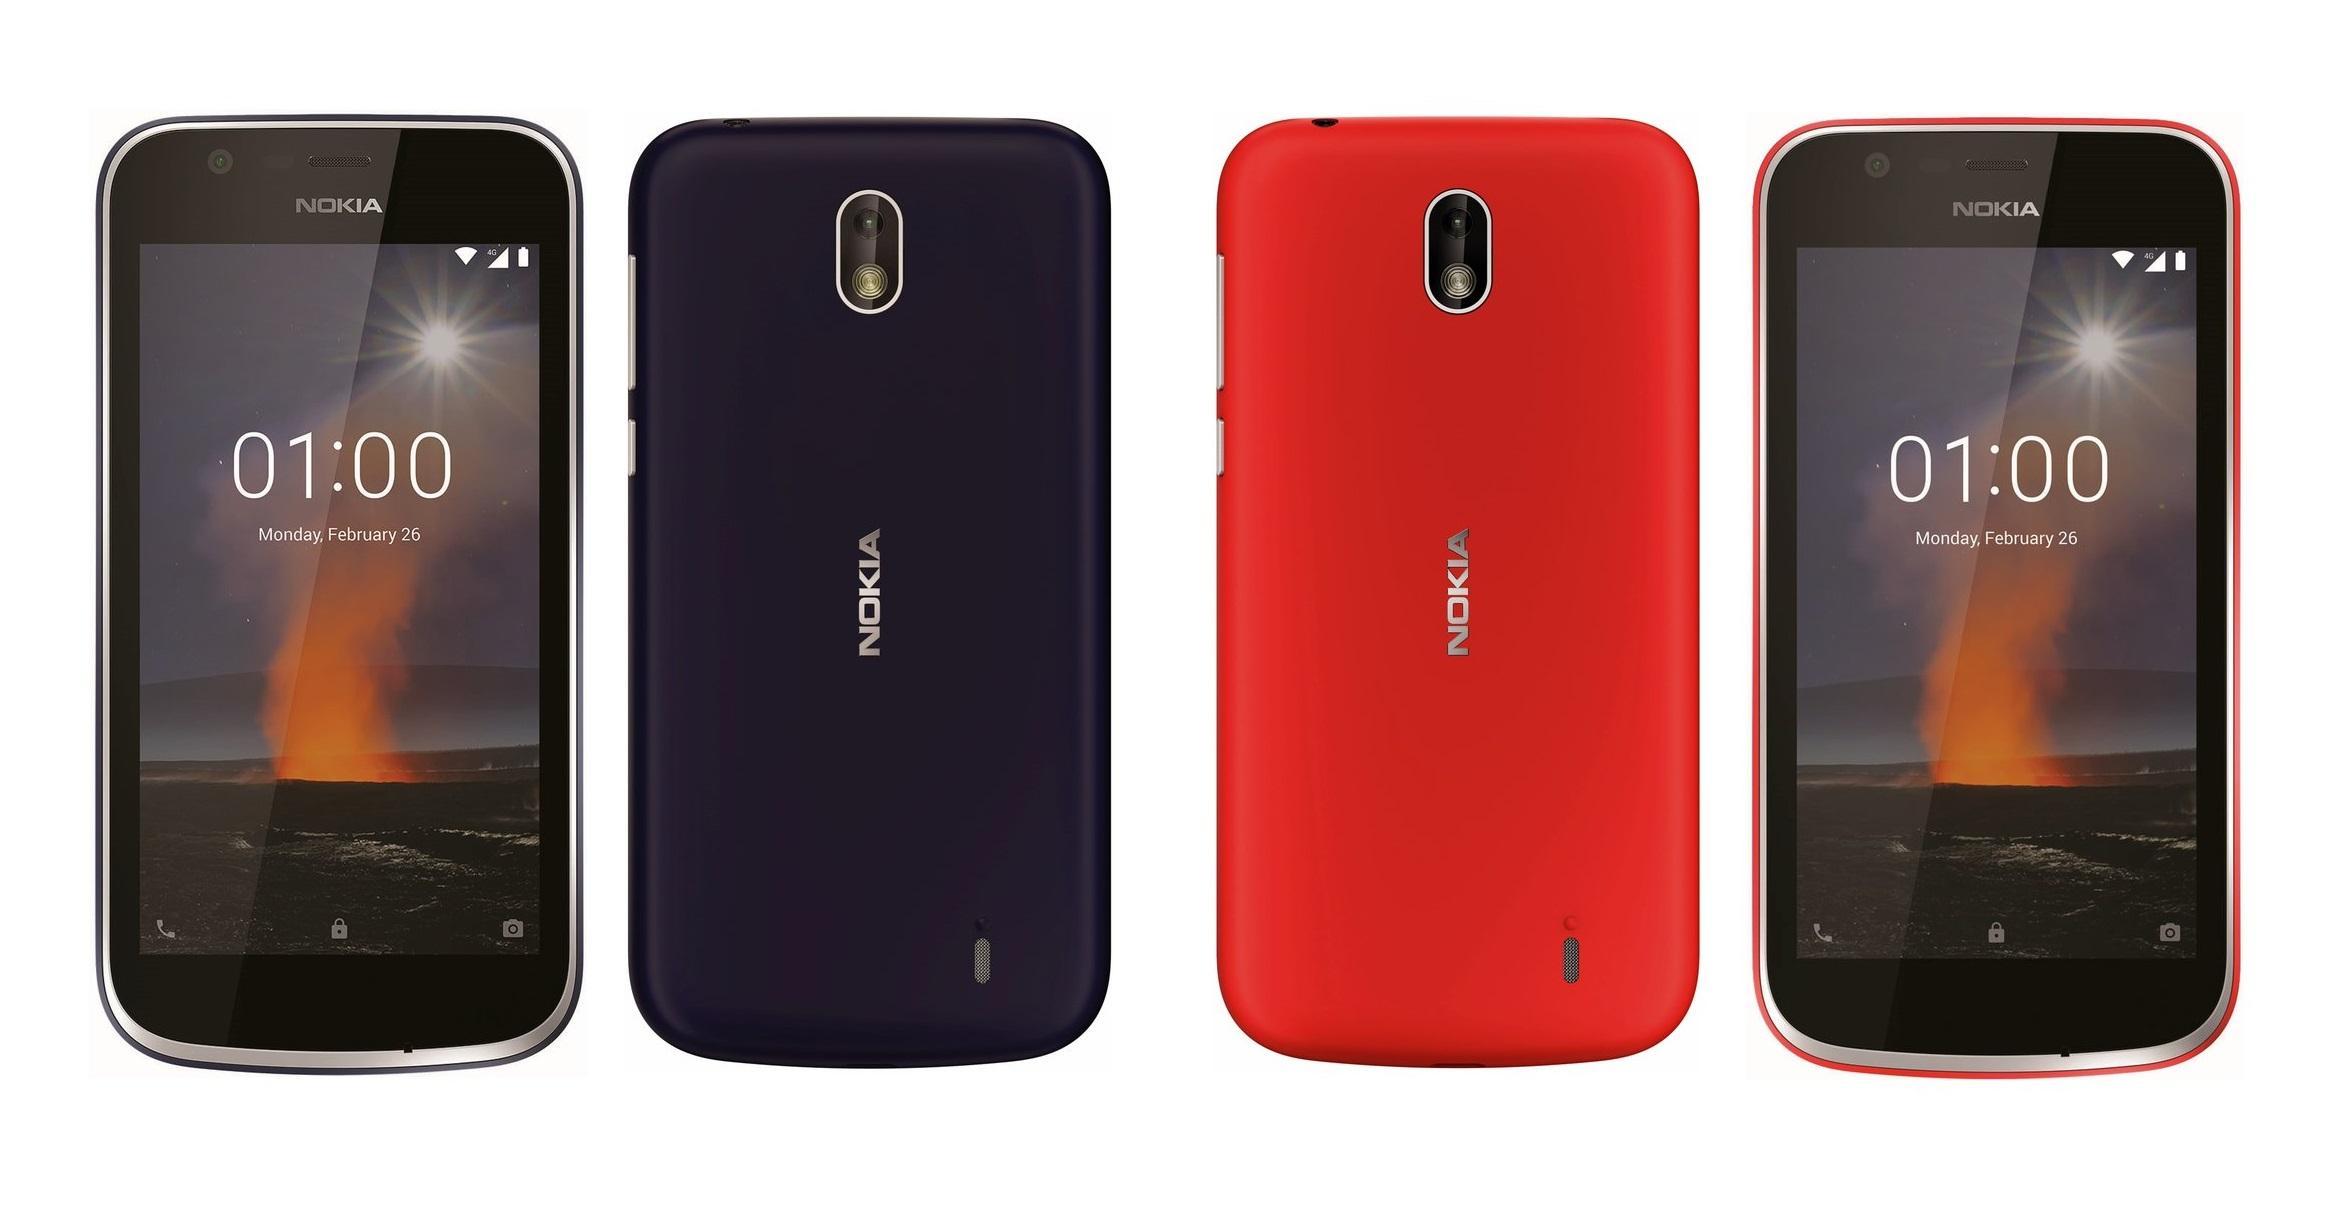 Hindistan'da Android Oreo (Go Edition) ile Nokia 1 piyasaya çıktı